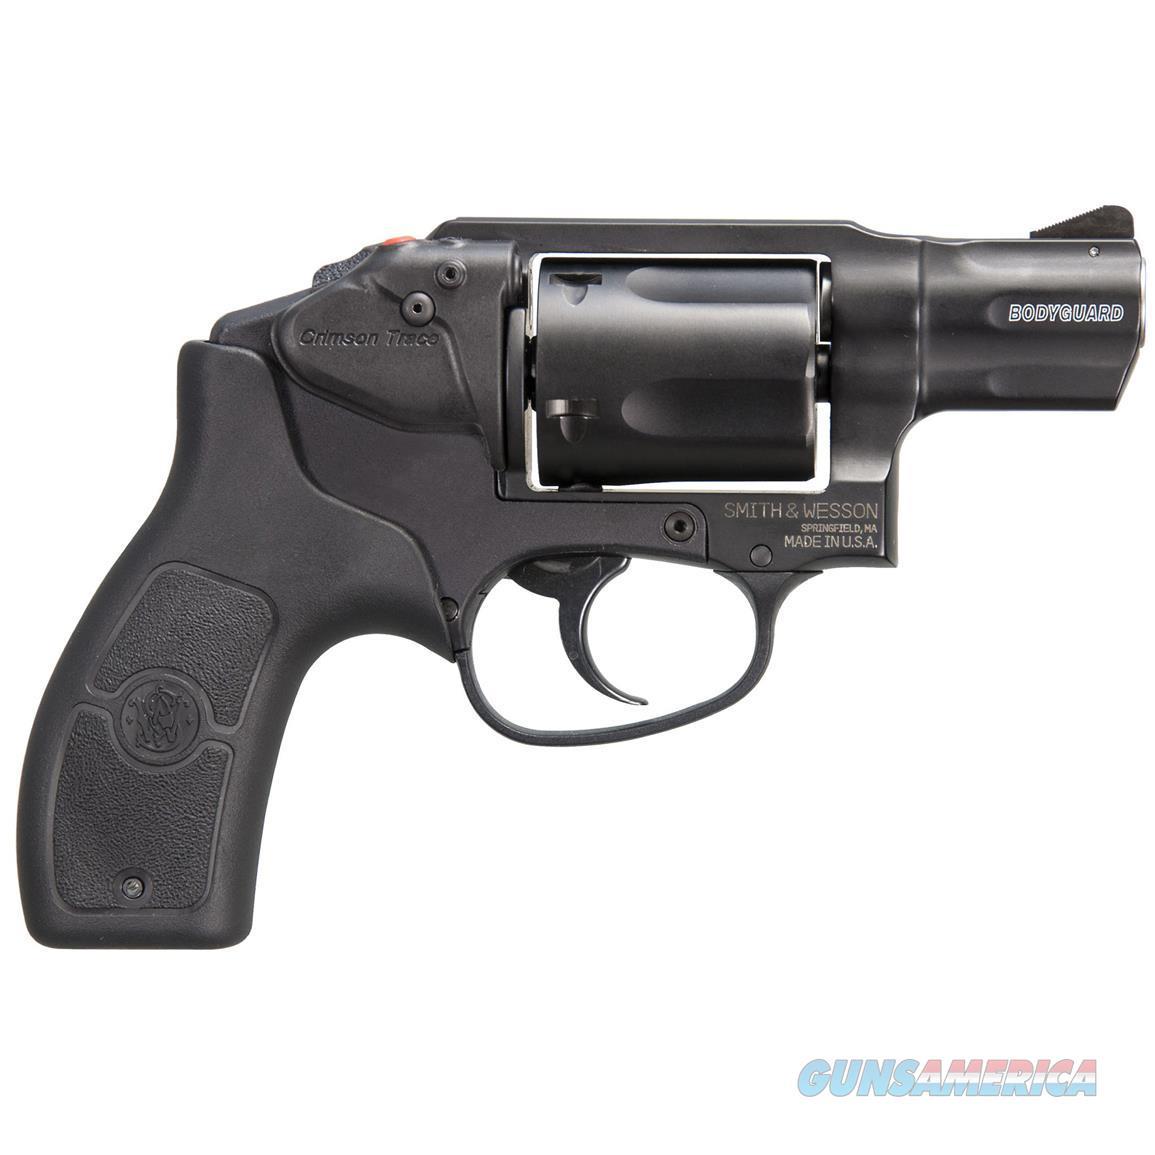 Smith & Wesson M&P Bodyguard 38 Crimson Trace .38 Special 10062   Guns > Pistols > Smith & Wesson Revolvers > Small Frame ( J )